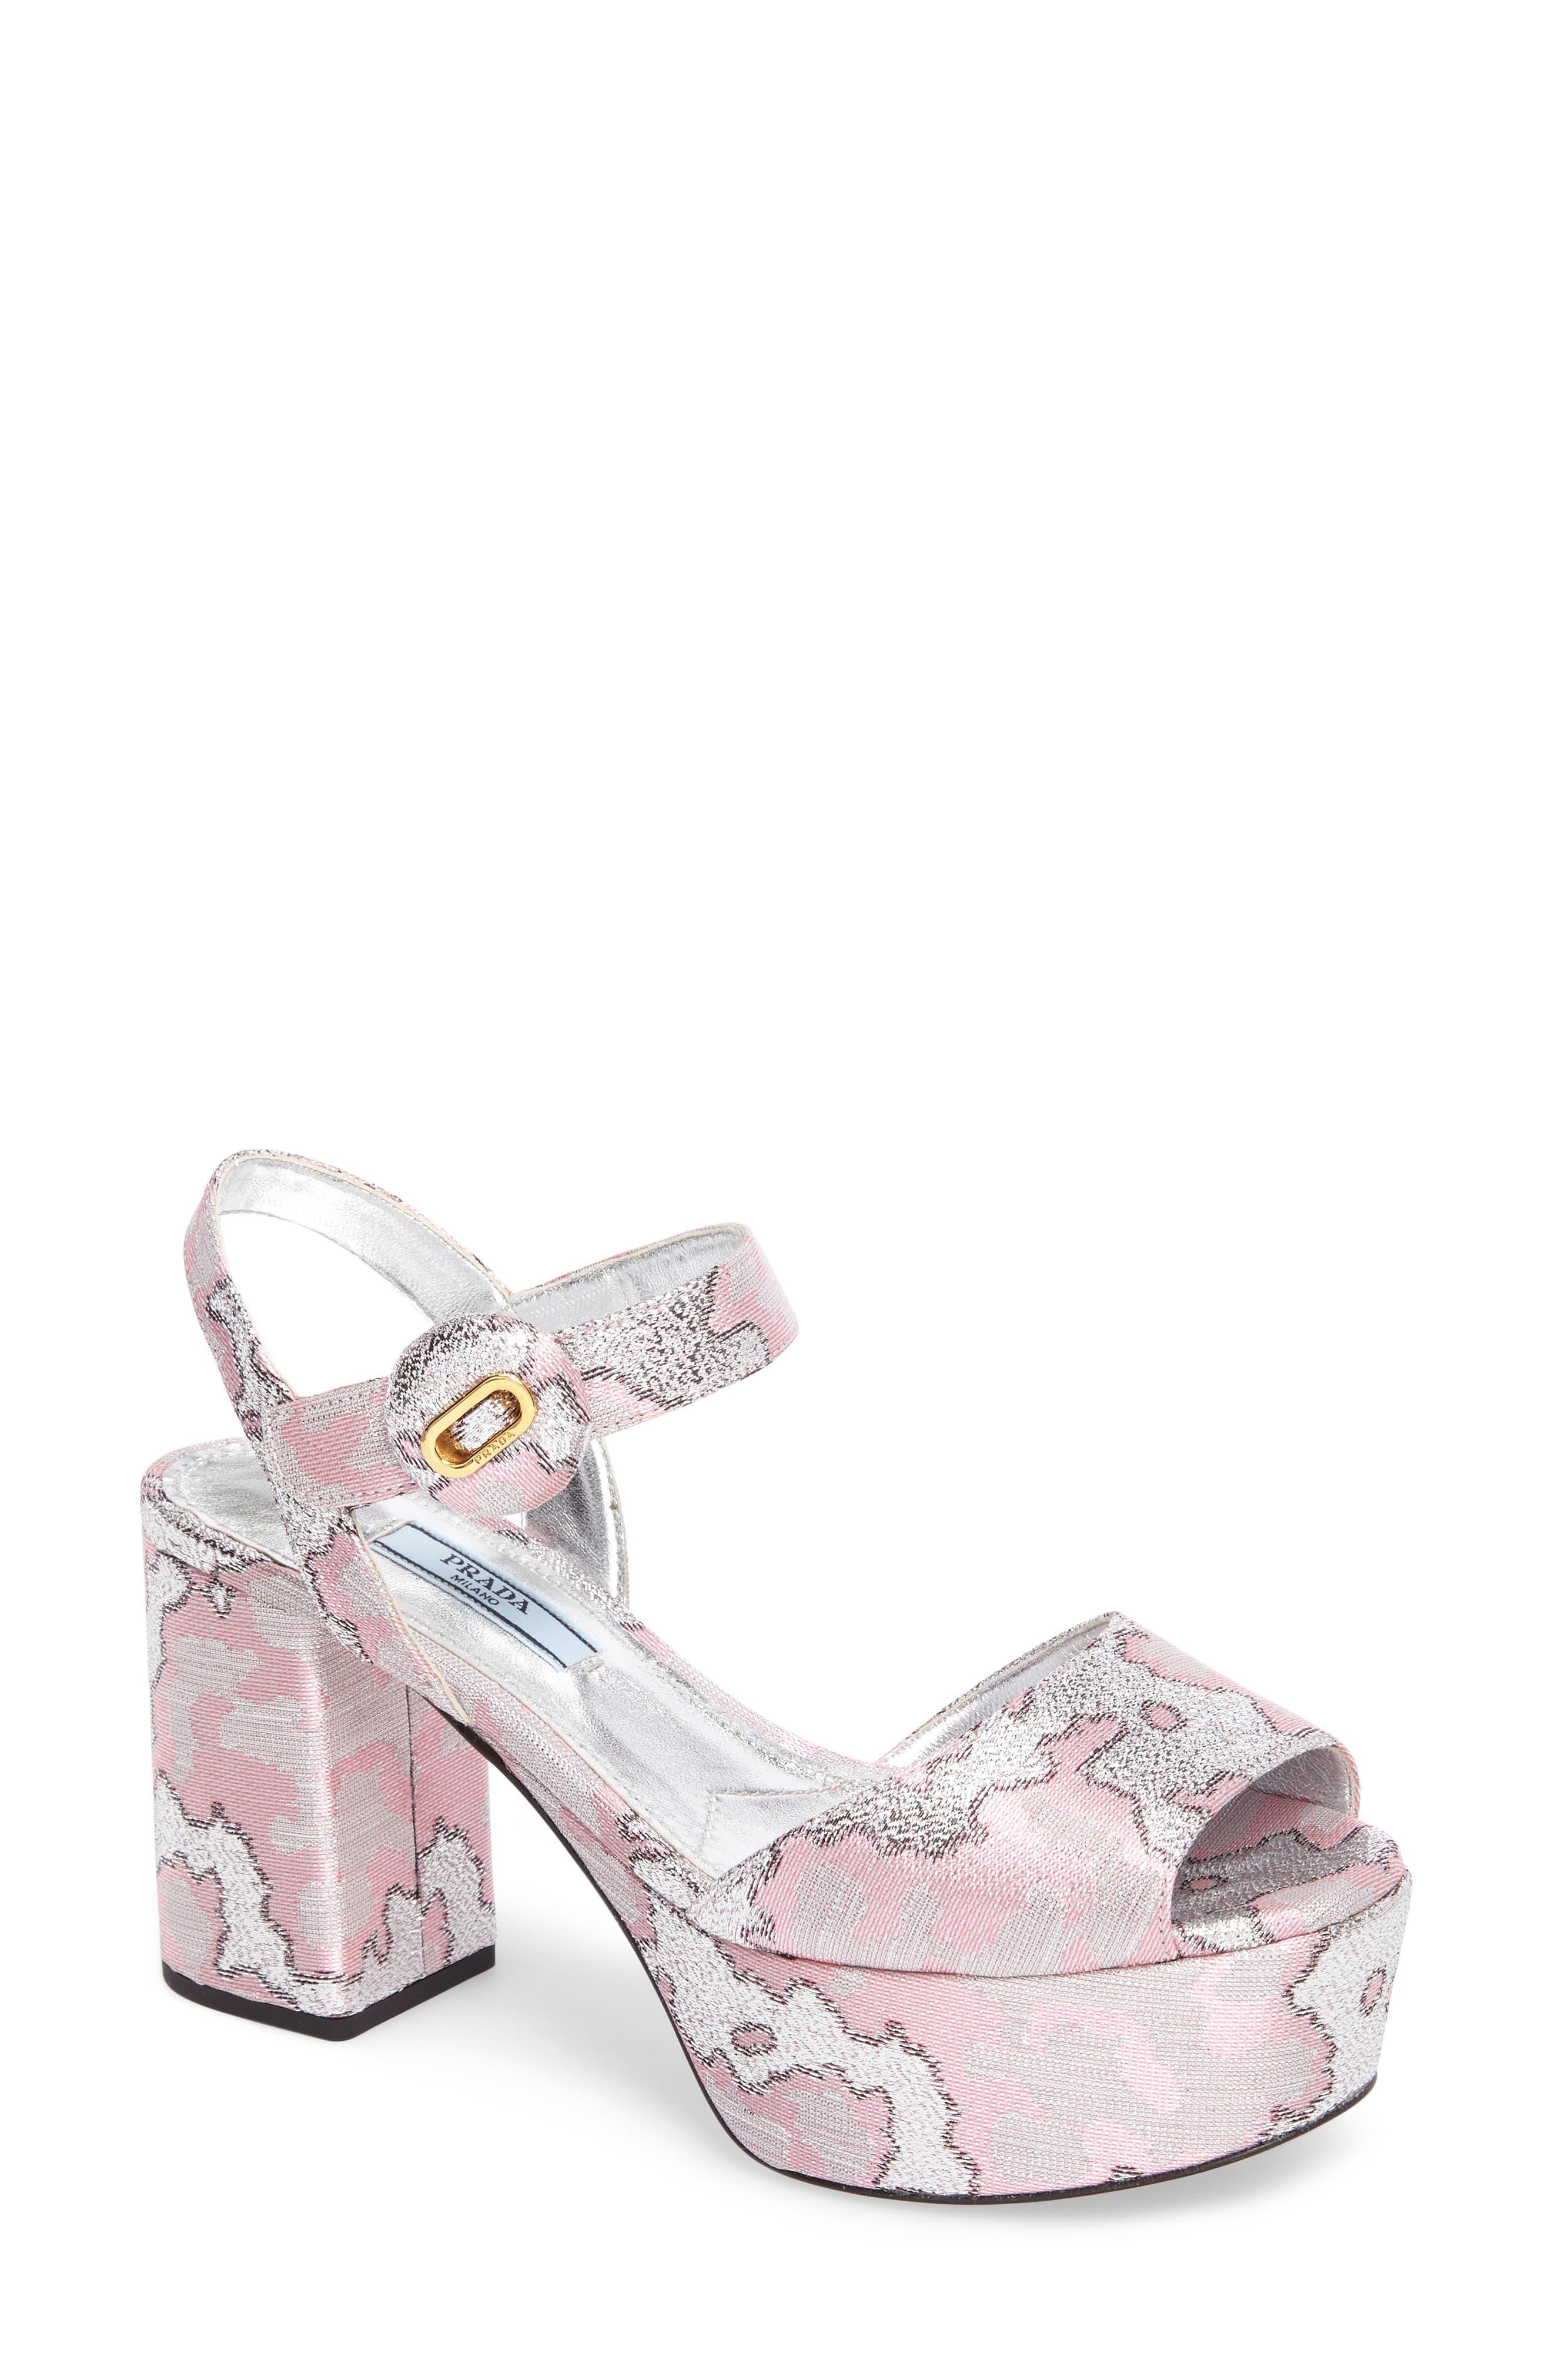 Ankle Strap Platform Sandal,                             Main thumbnail 1, color,                             Pink